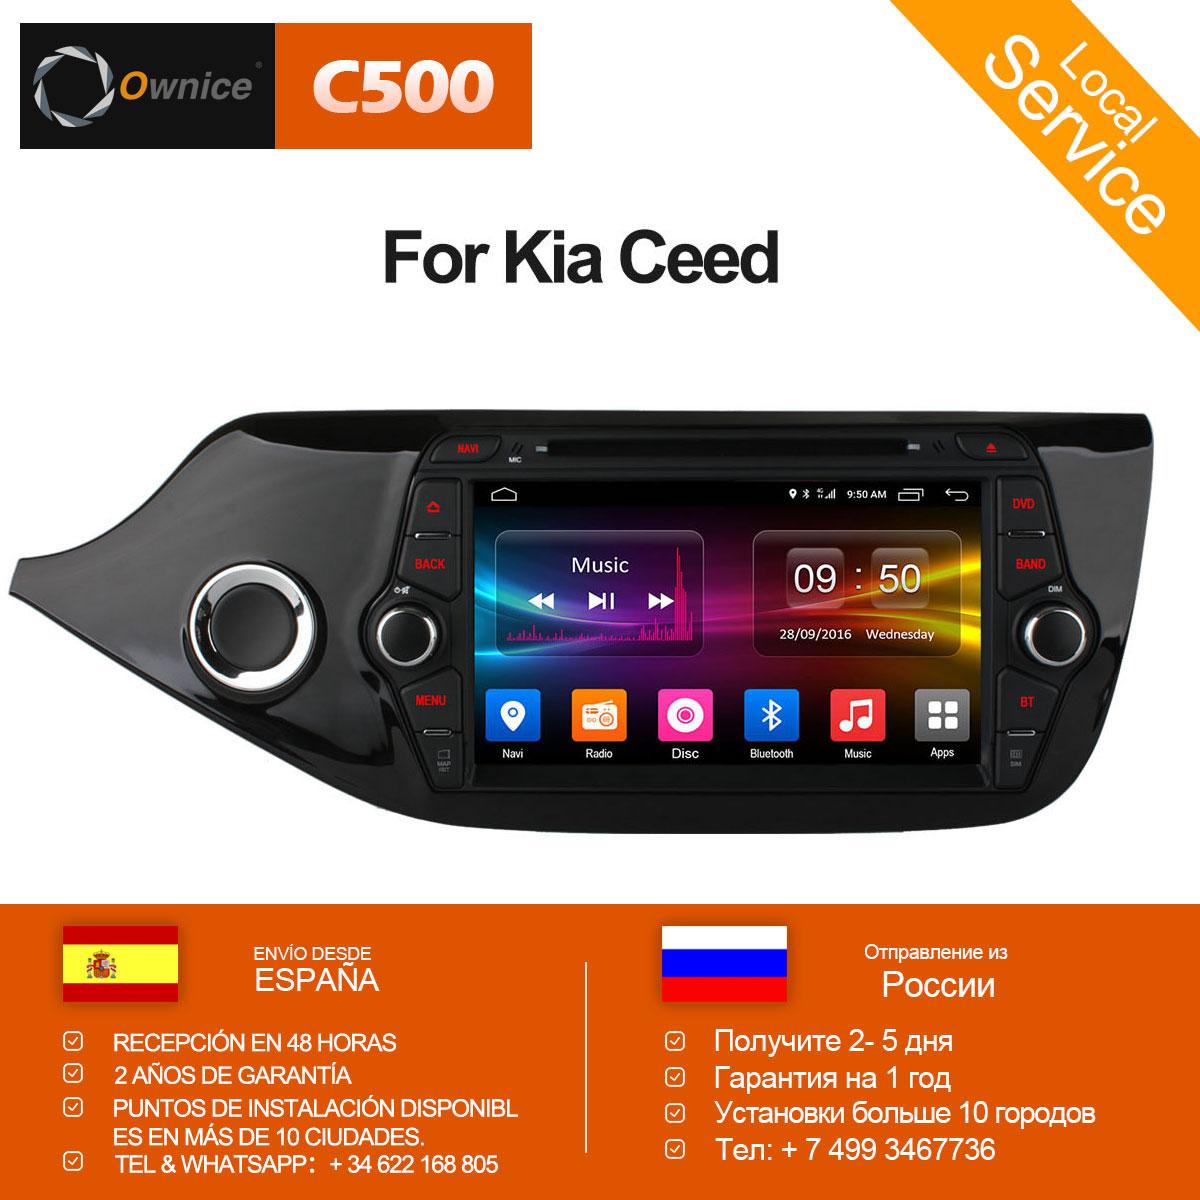 Ownice C500 4G SIM LTE Octa 8 Core Android 6.0 For Kia CEED 2013-2015 Car DVD Player GPS Navi Radio WIFI 4G BT 2GB RAM 32G ROM ownice c500 android 6 0 octa 8 core car dvd player for suzuki grand vitara android 6 0 wifi 4g gps bt radio 2gb ram 32gb rom